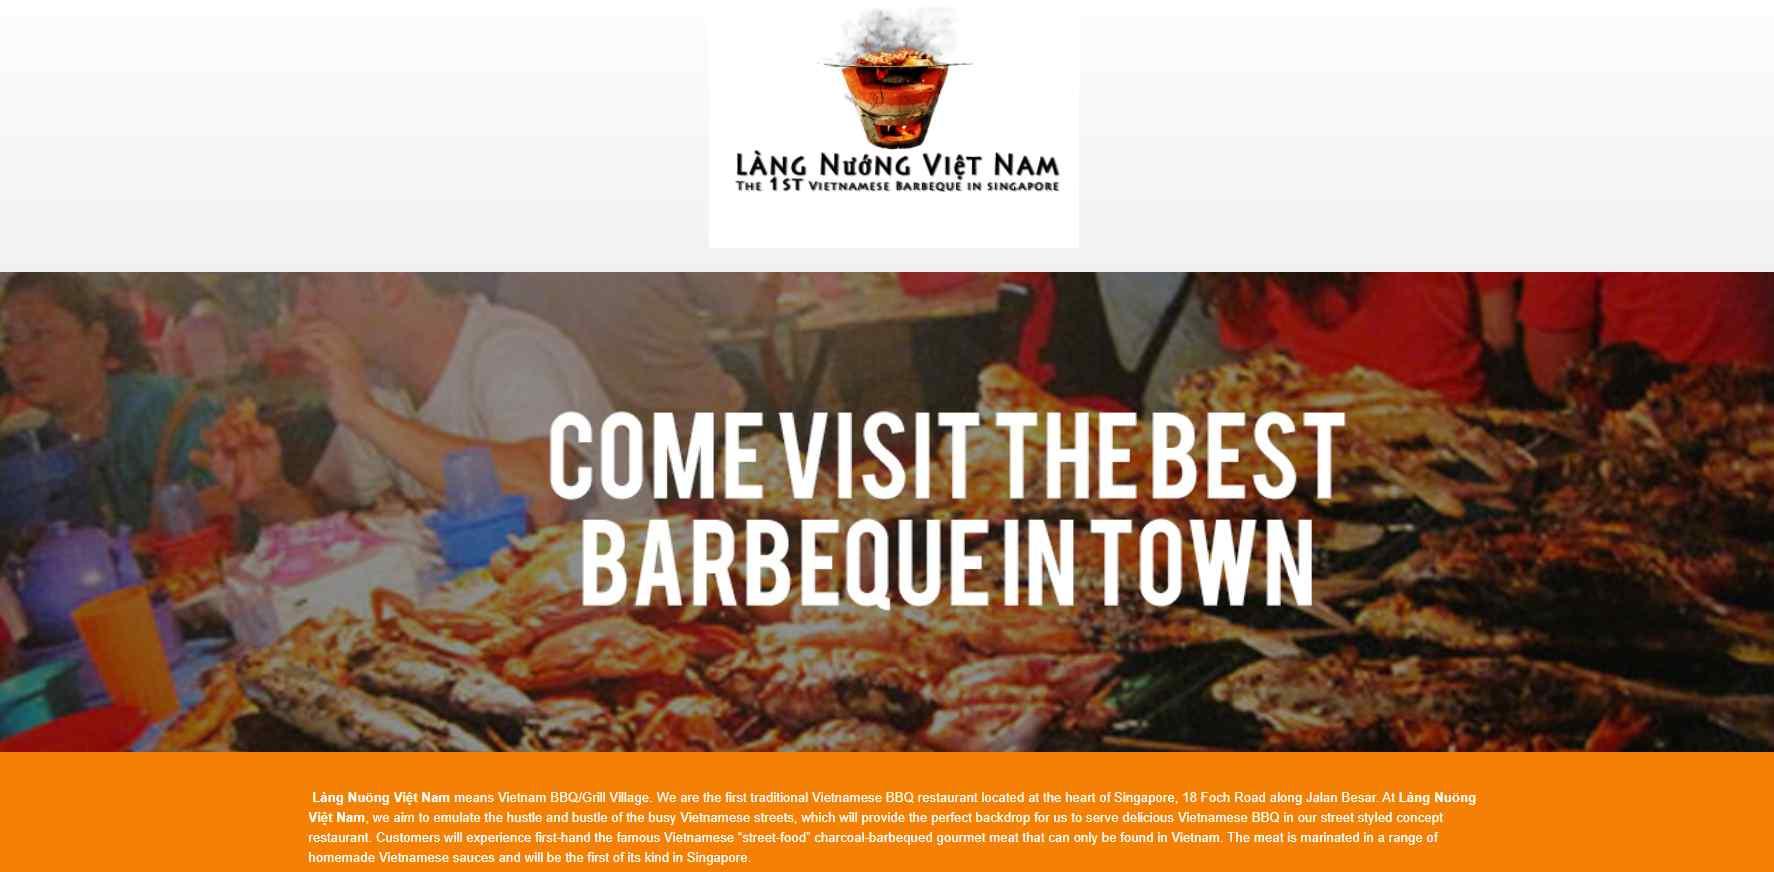 Lang Nuong Top Vietnamese Food Restaurants in Singapore